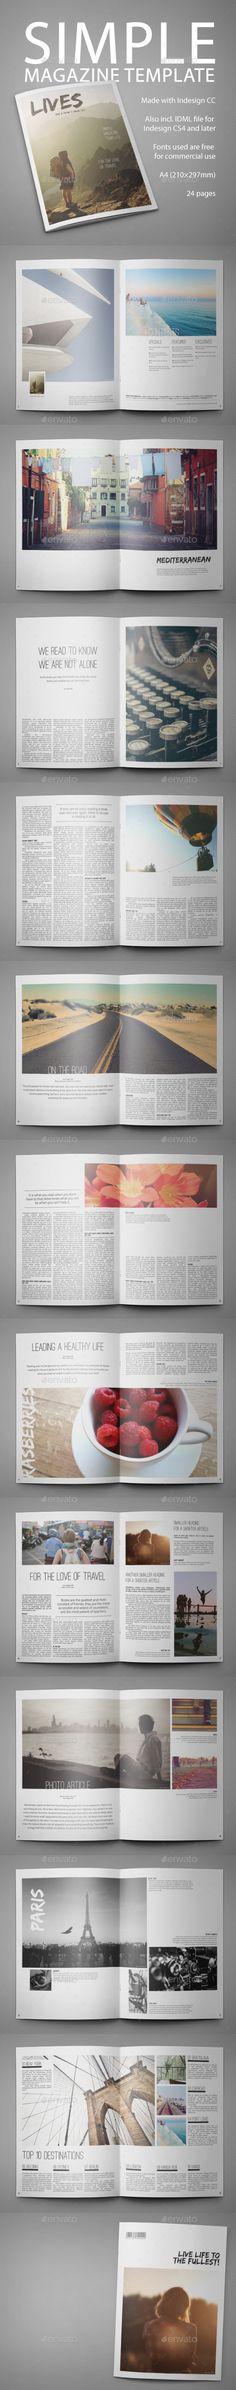 Simple Multipurpose Magazine Template | #magazinetemplate | Download: http://graphicriver.net/item/simple-multipurpose-magazine-template/10007527?ref=ksioks